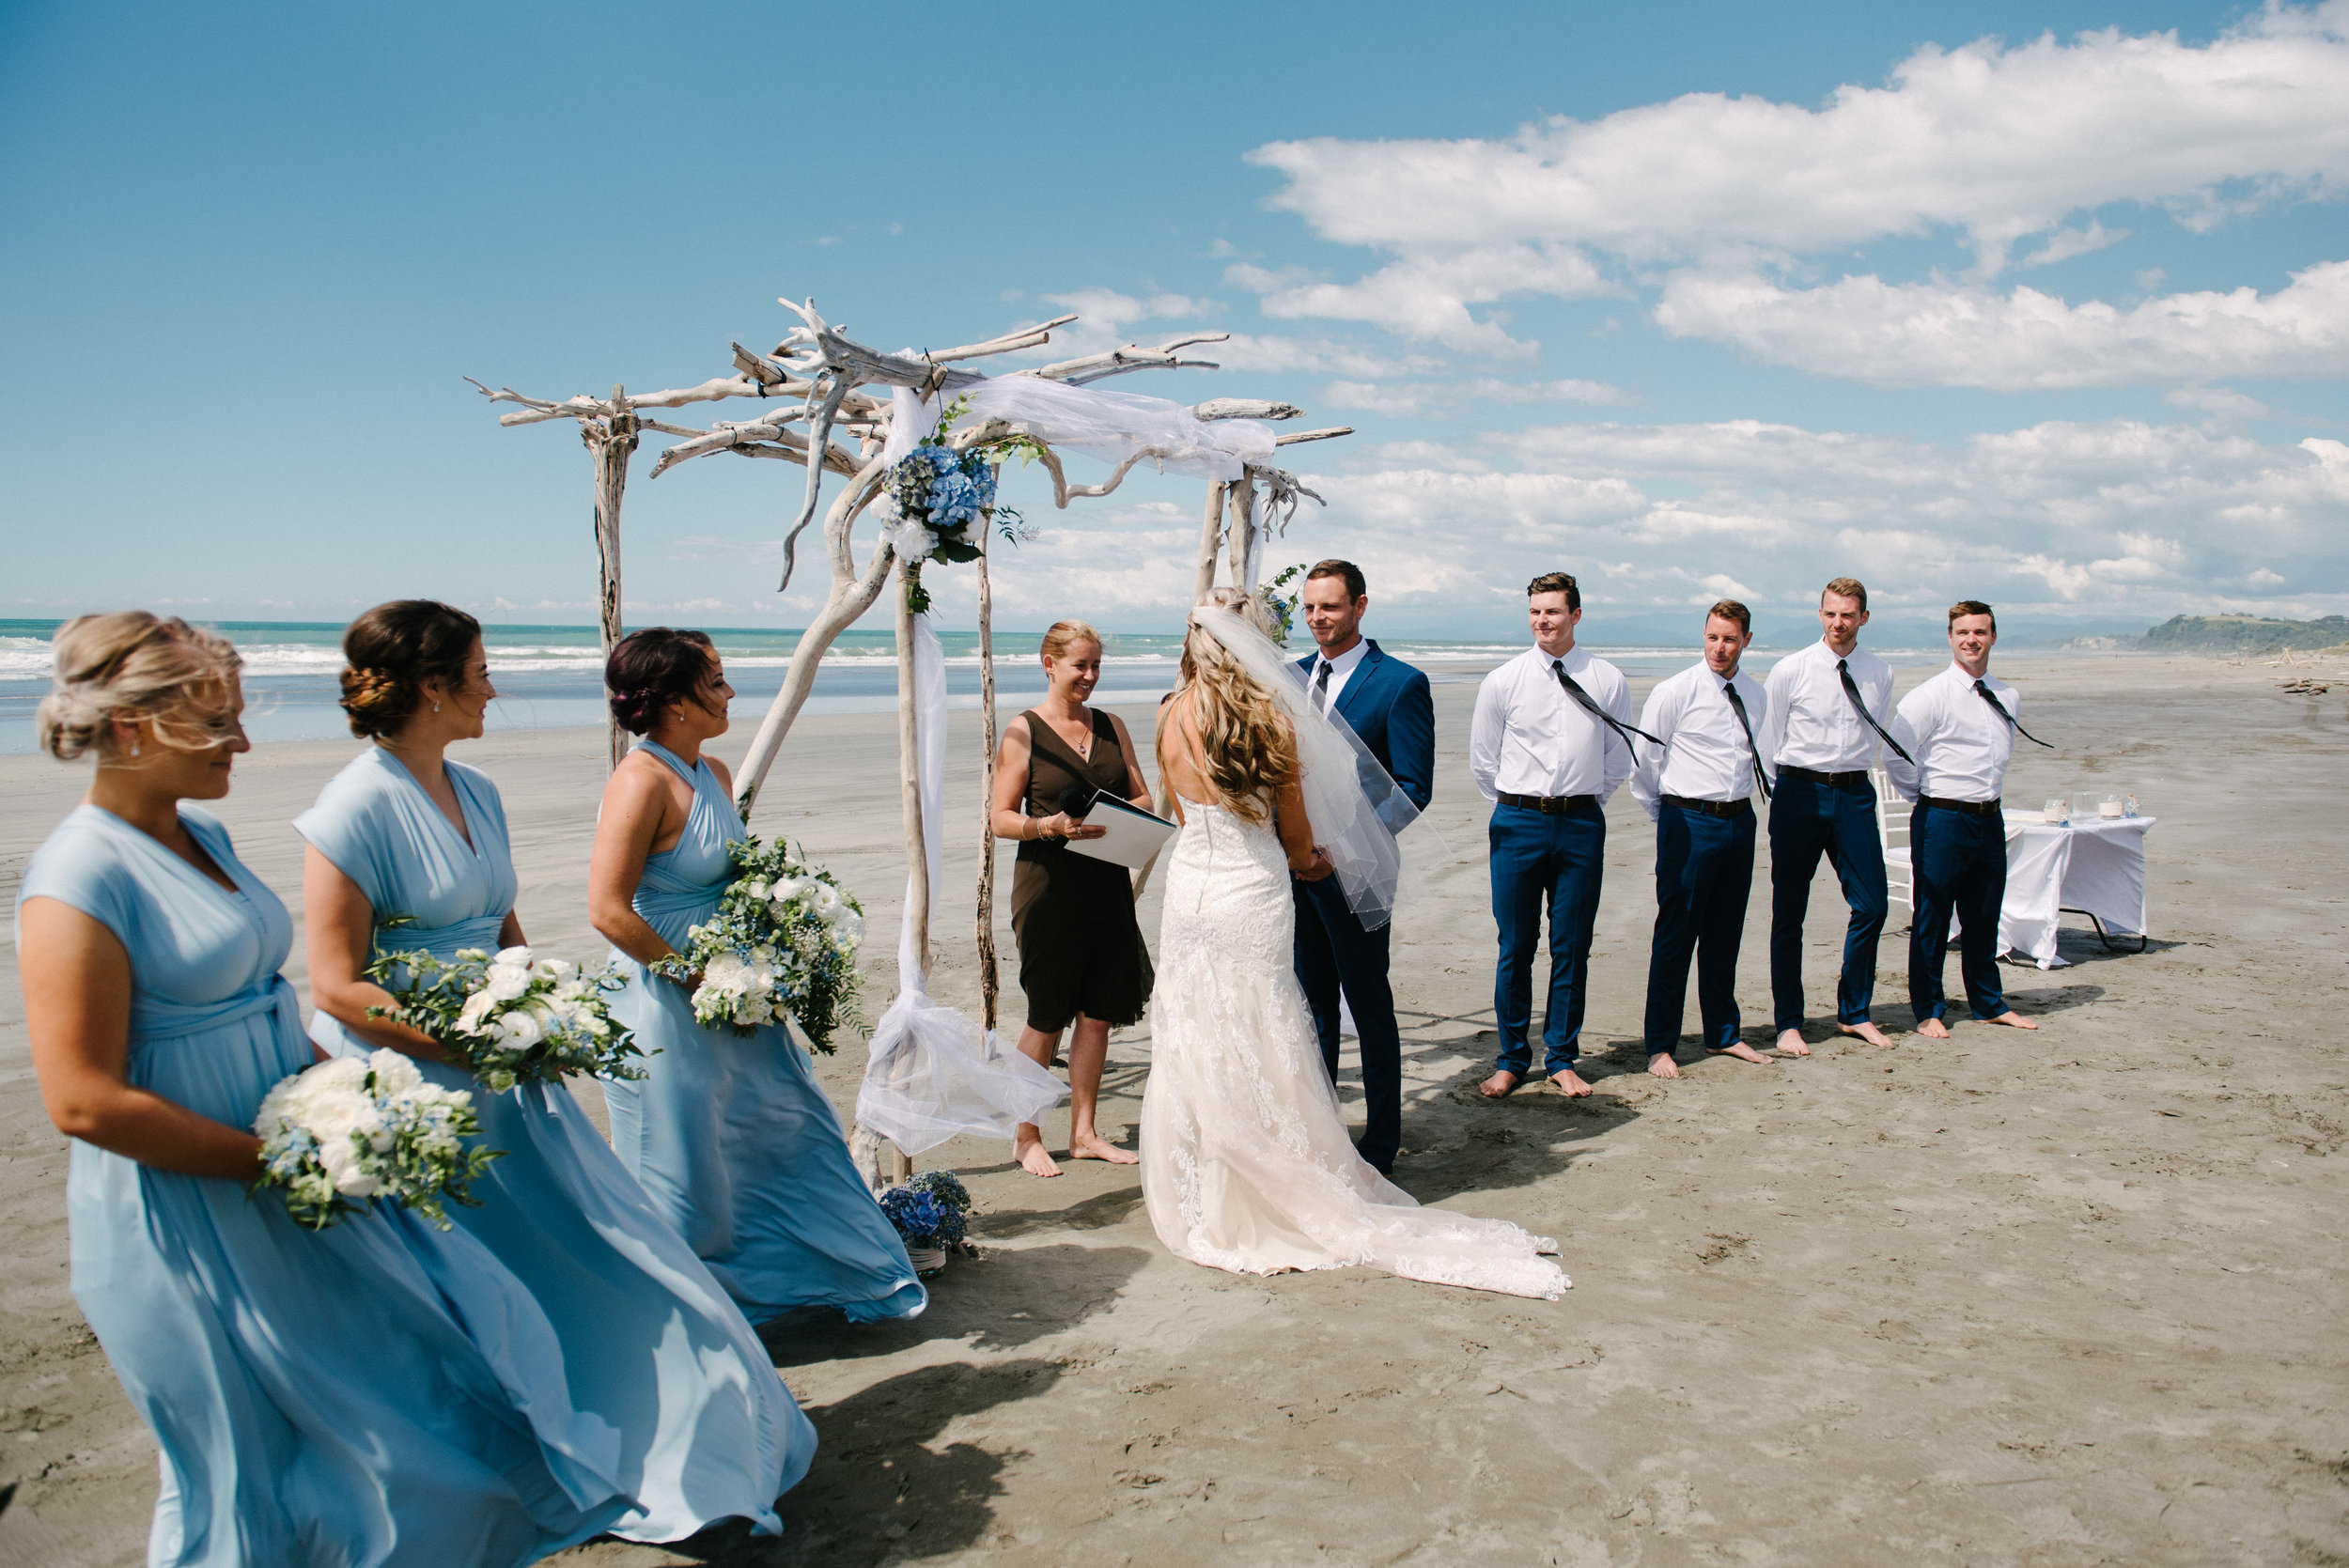 Jolanta-Nick-Wedding-Michael-Schultz-Photography-0335.jpg